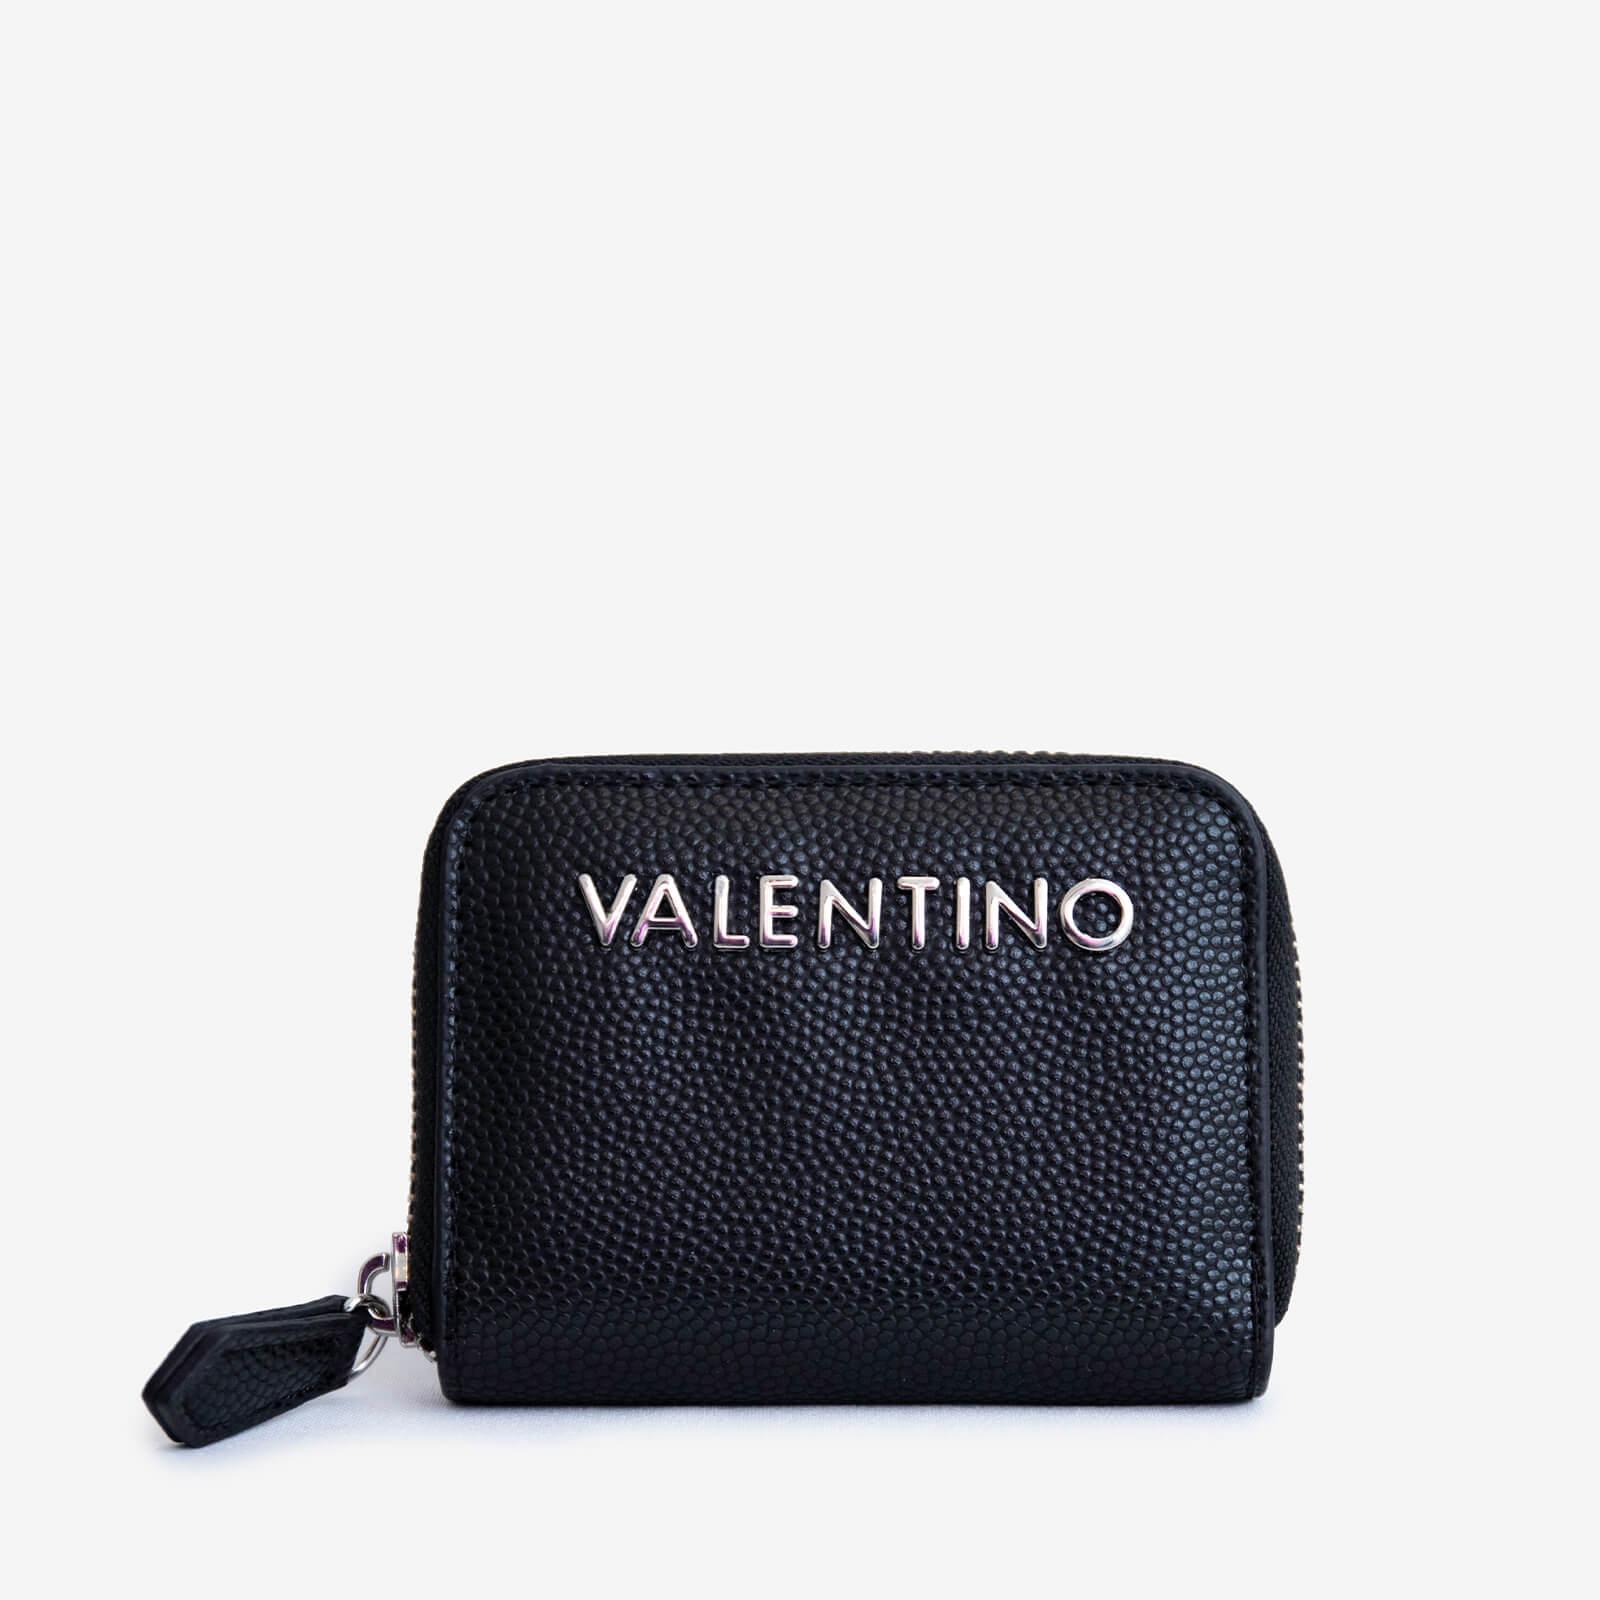 Valentino Bags Women's Divina Coin Purse - Black